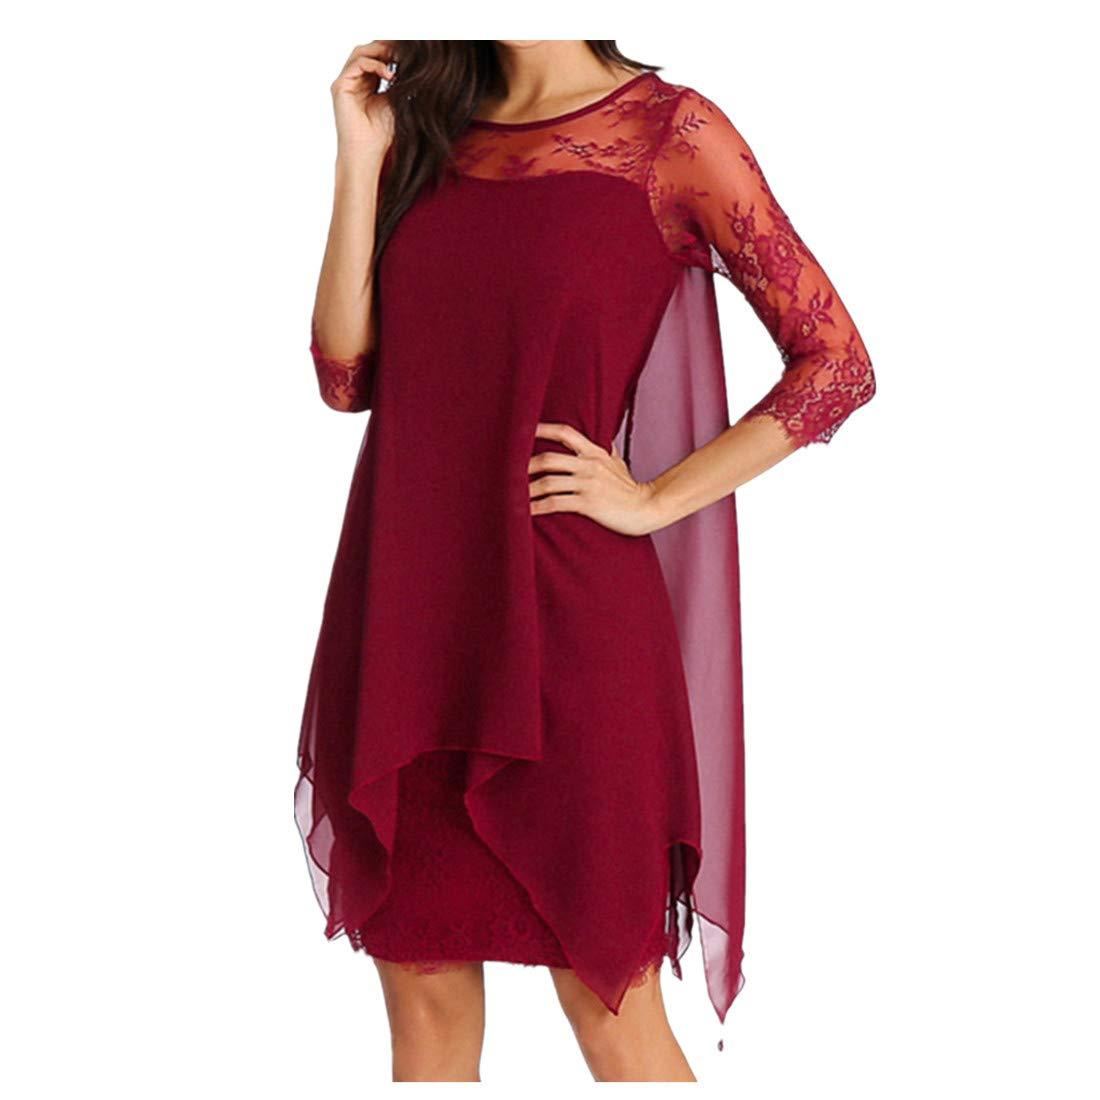 Nadition Ladies Elegant Dress ❤️️ Women Fashion Chiffon Overlay 3/4 Sleeve Lace Shift Dress Summer Evening Party Dress